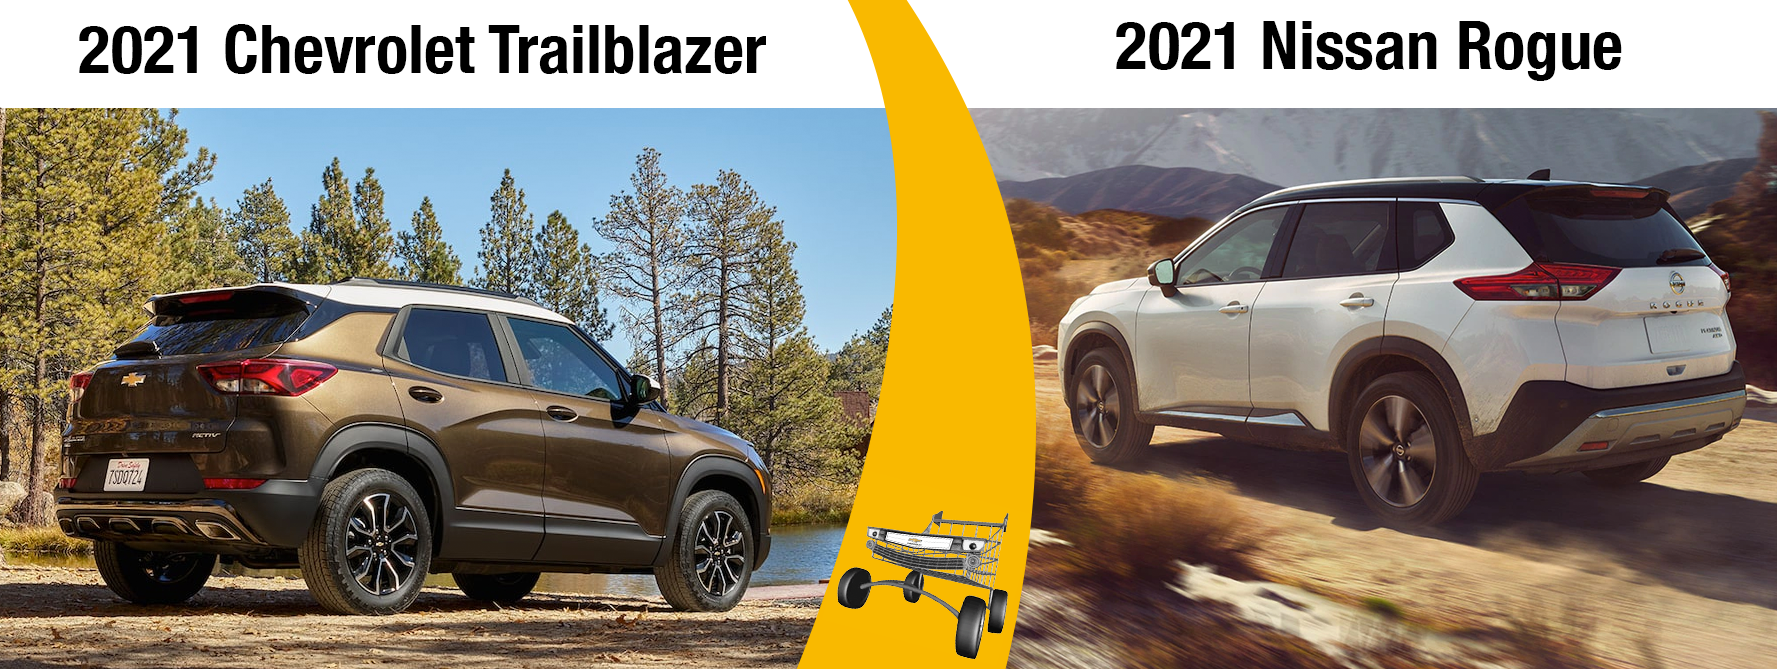 2021 Chevy Trailblazer vs 2021 Nissan Rogue Chicago